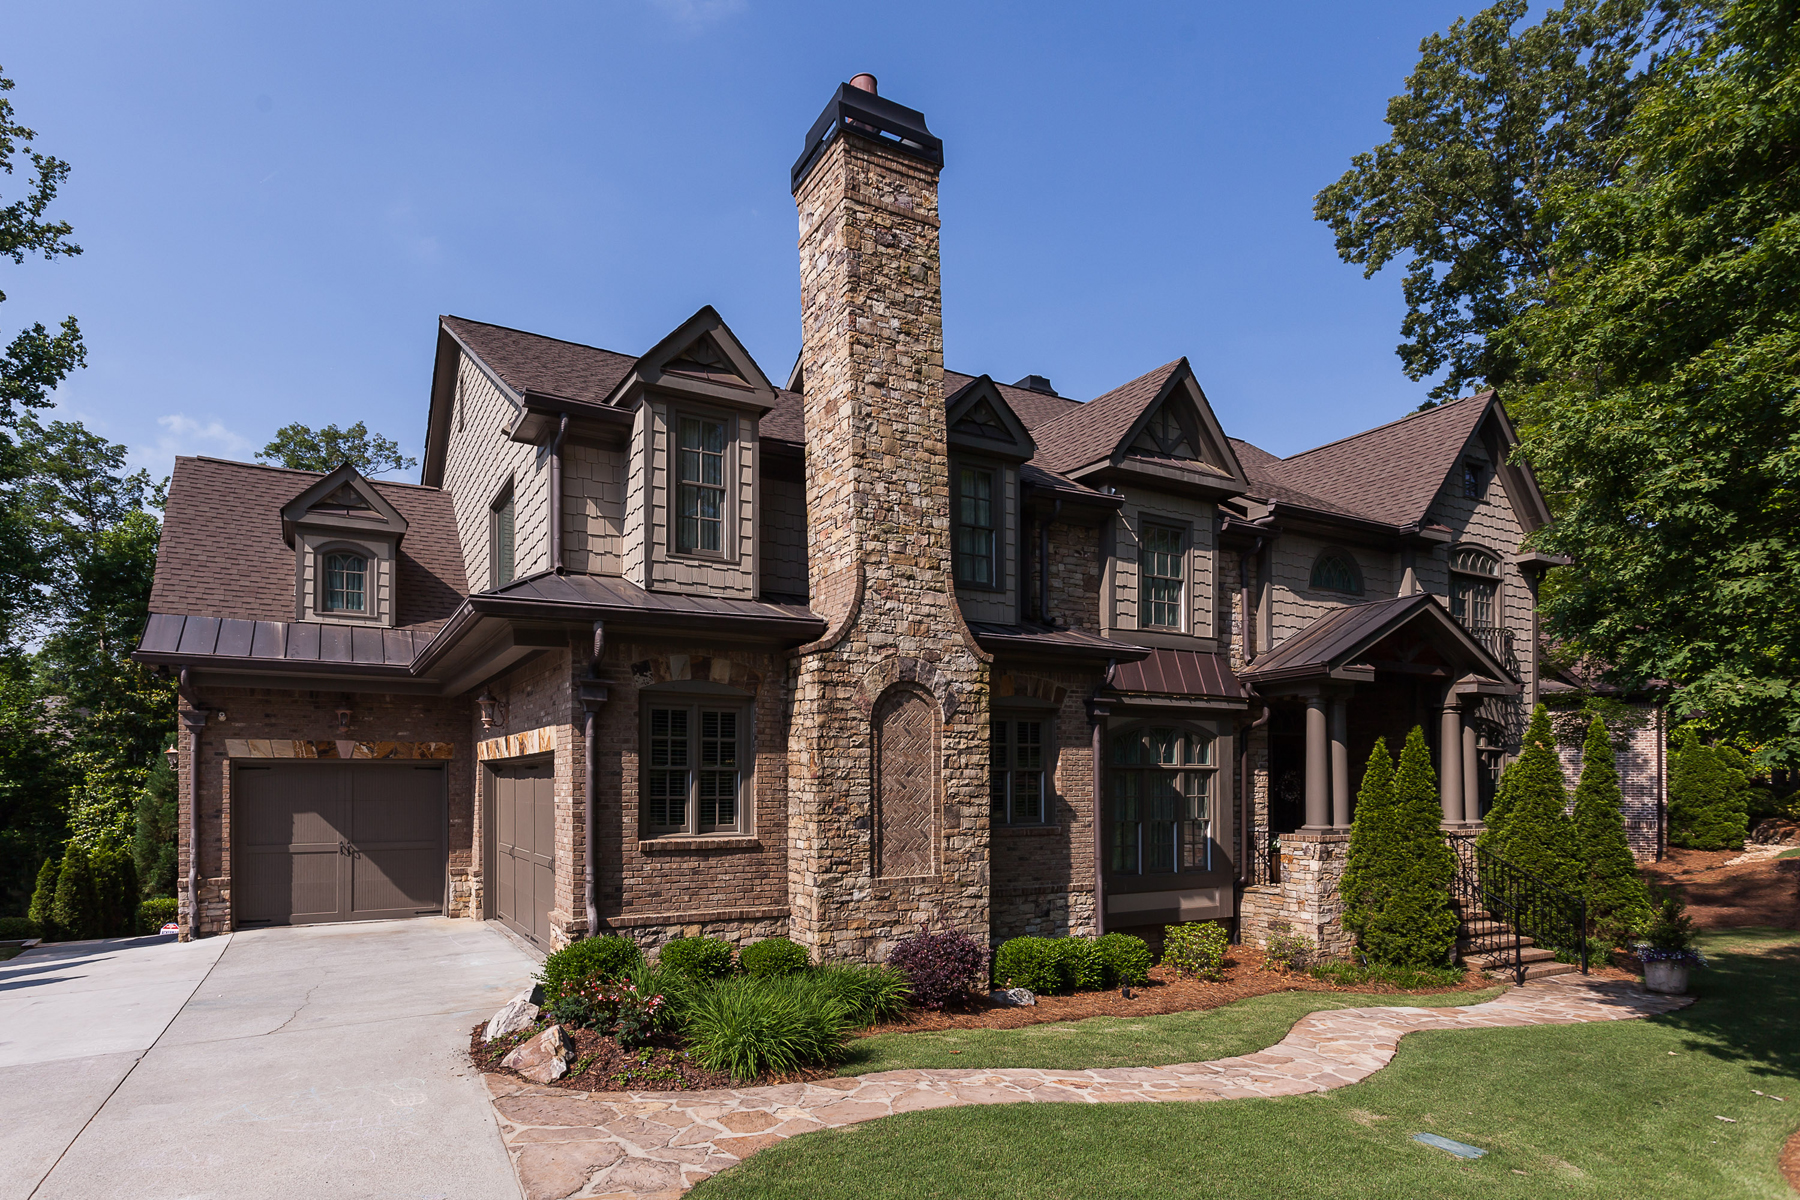 Single Family Home for Sale at Shows Like A Model 1539 Windsor Parkway NE Brookhaven, Atlanta, Georgia 30319 United States